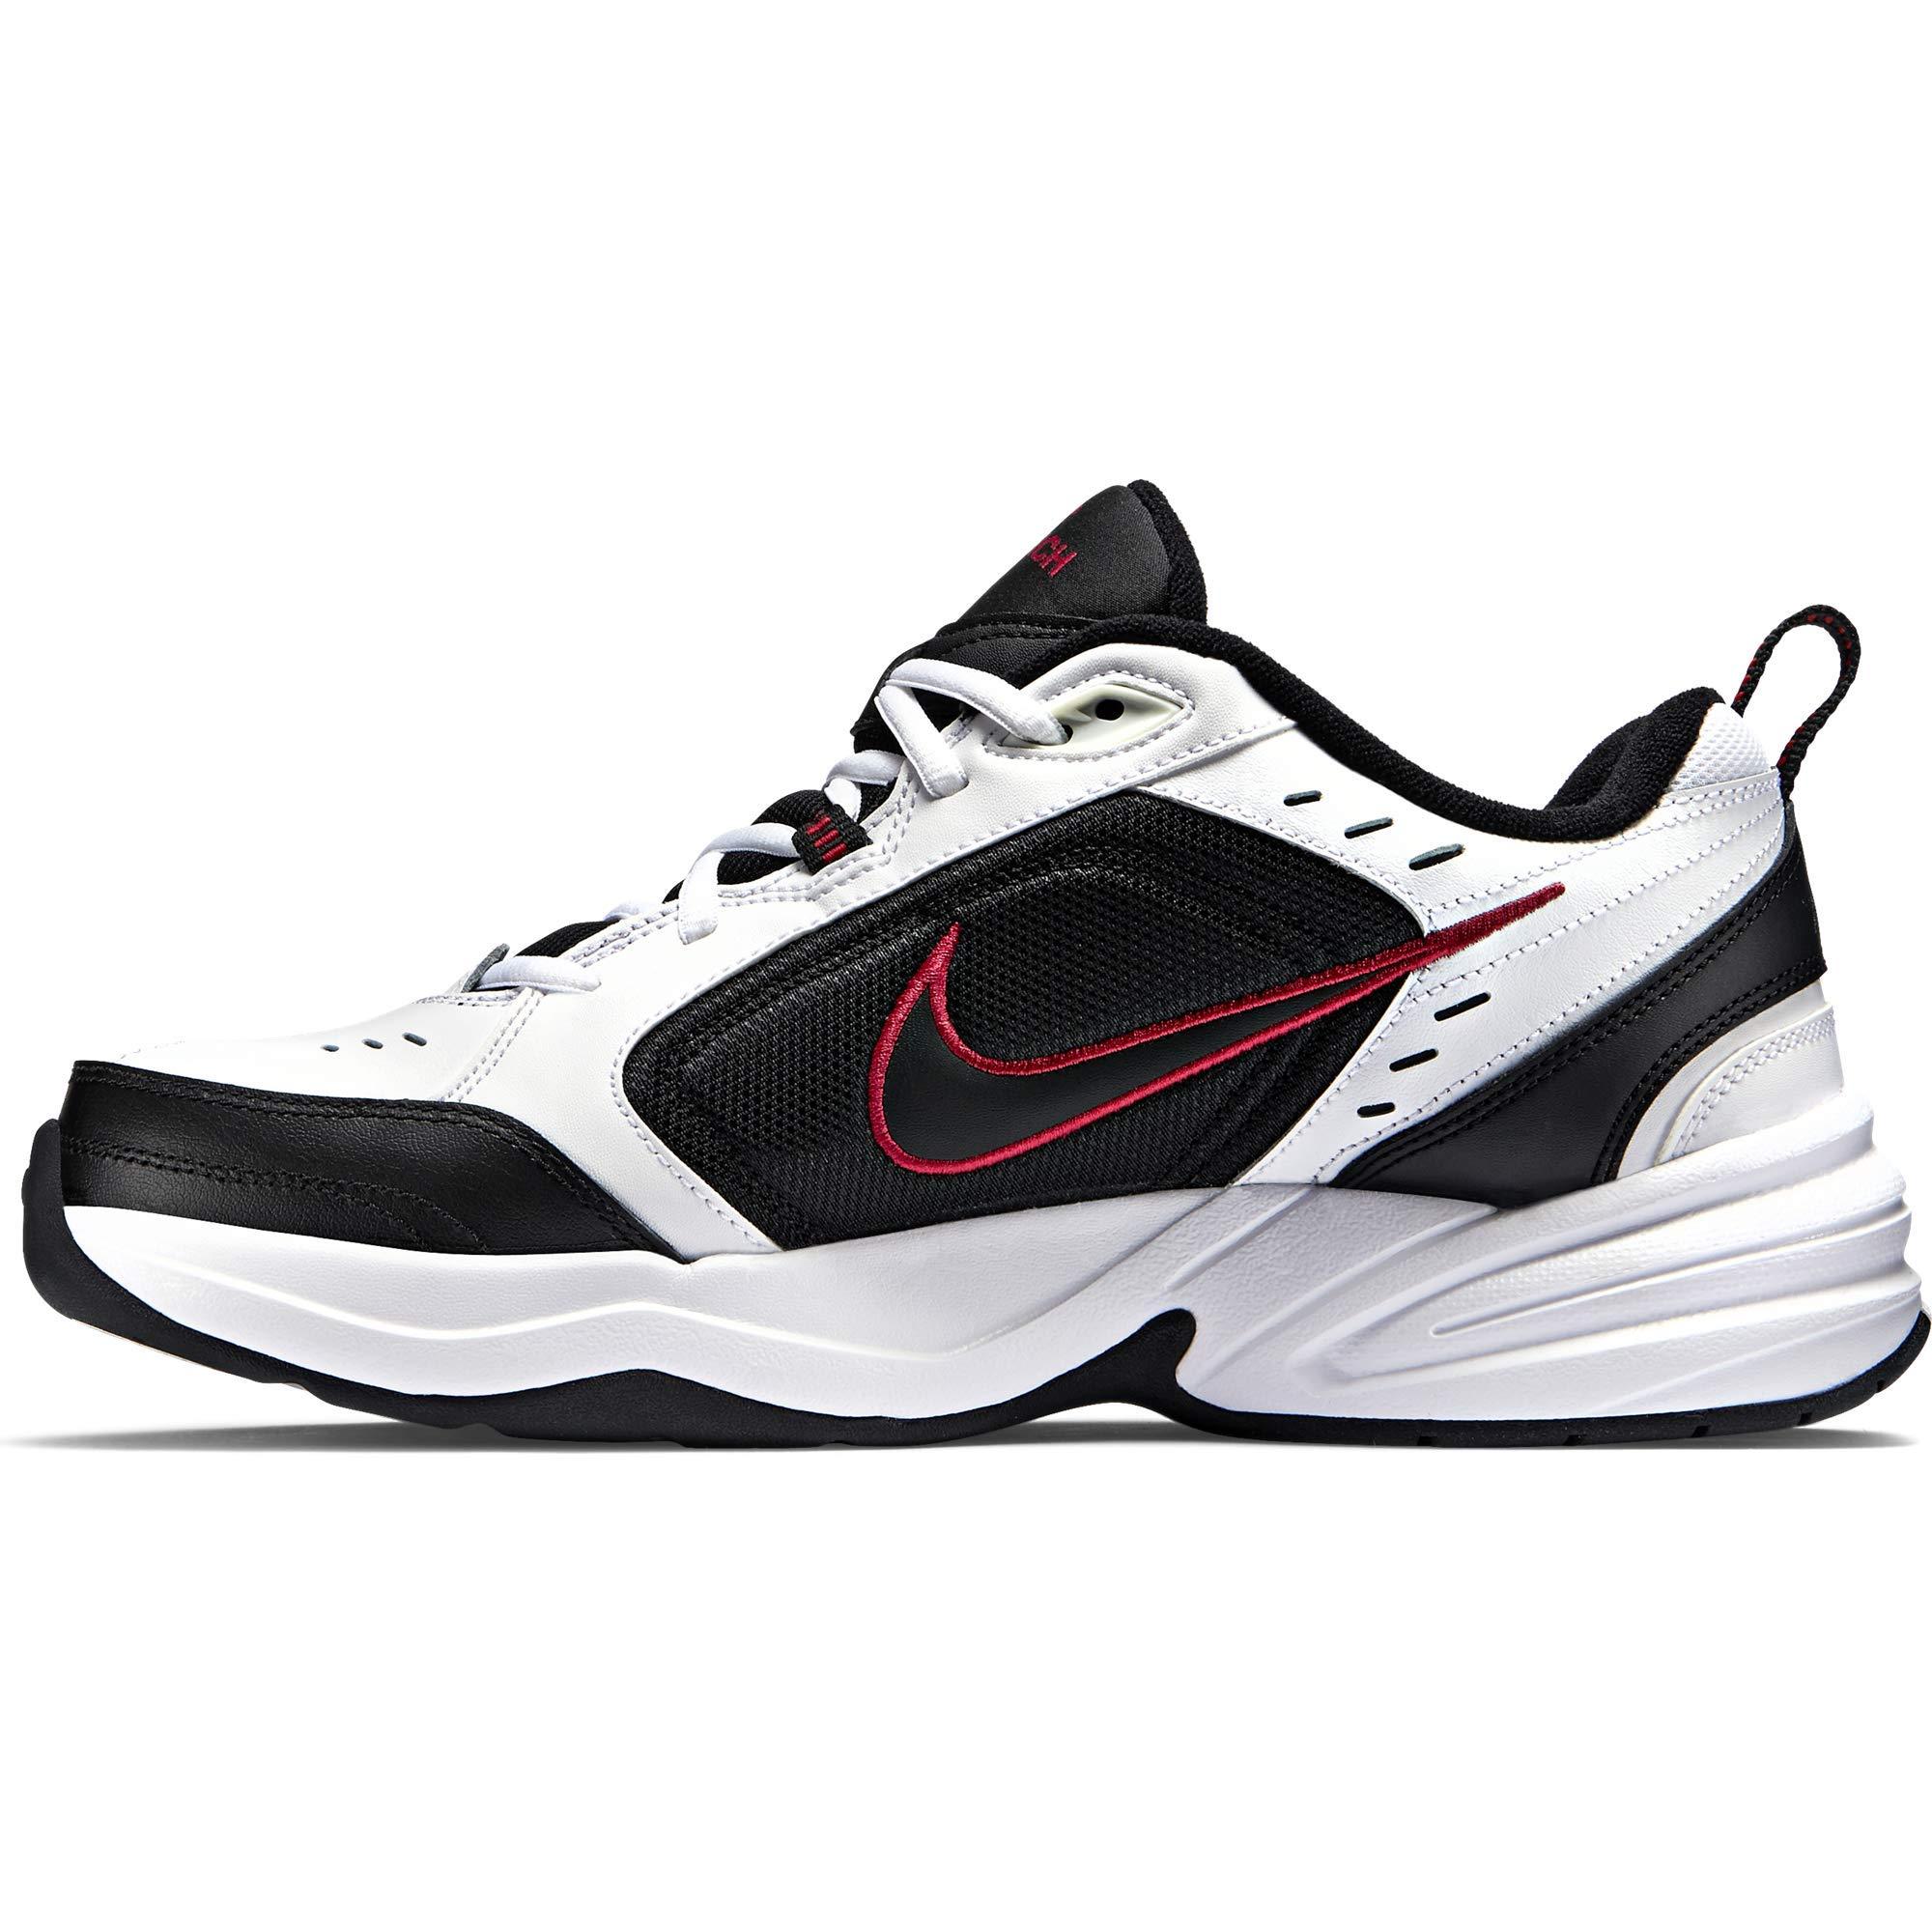 Nike Men's Air Monarch IV Cross Trainer, White/Black, 7.0 Regular US by Nike (Image #6)